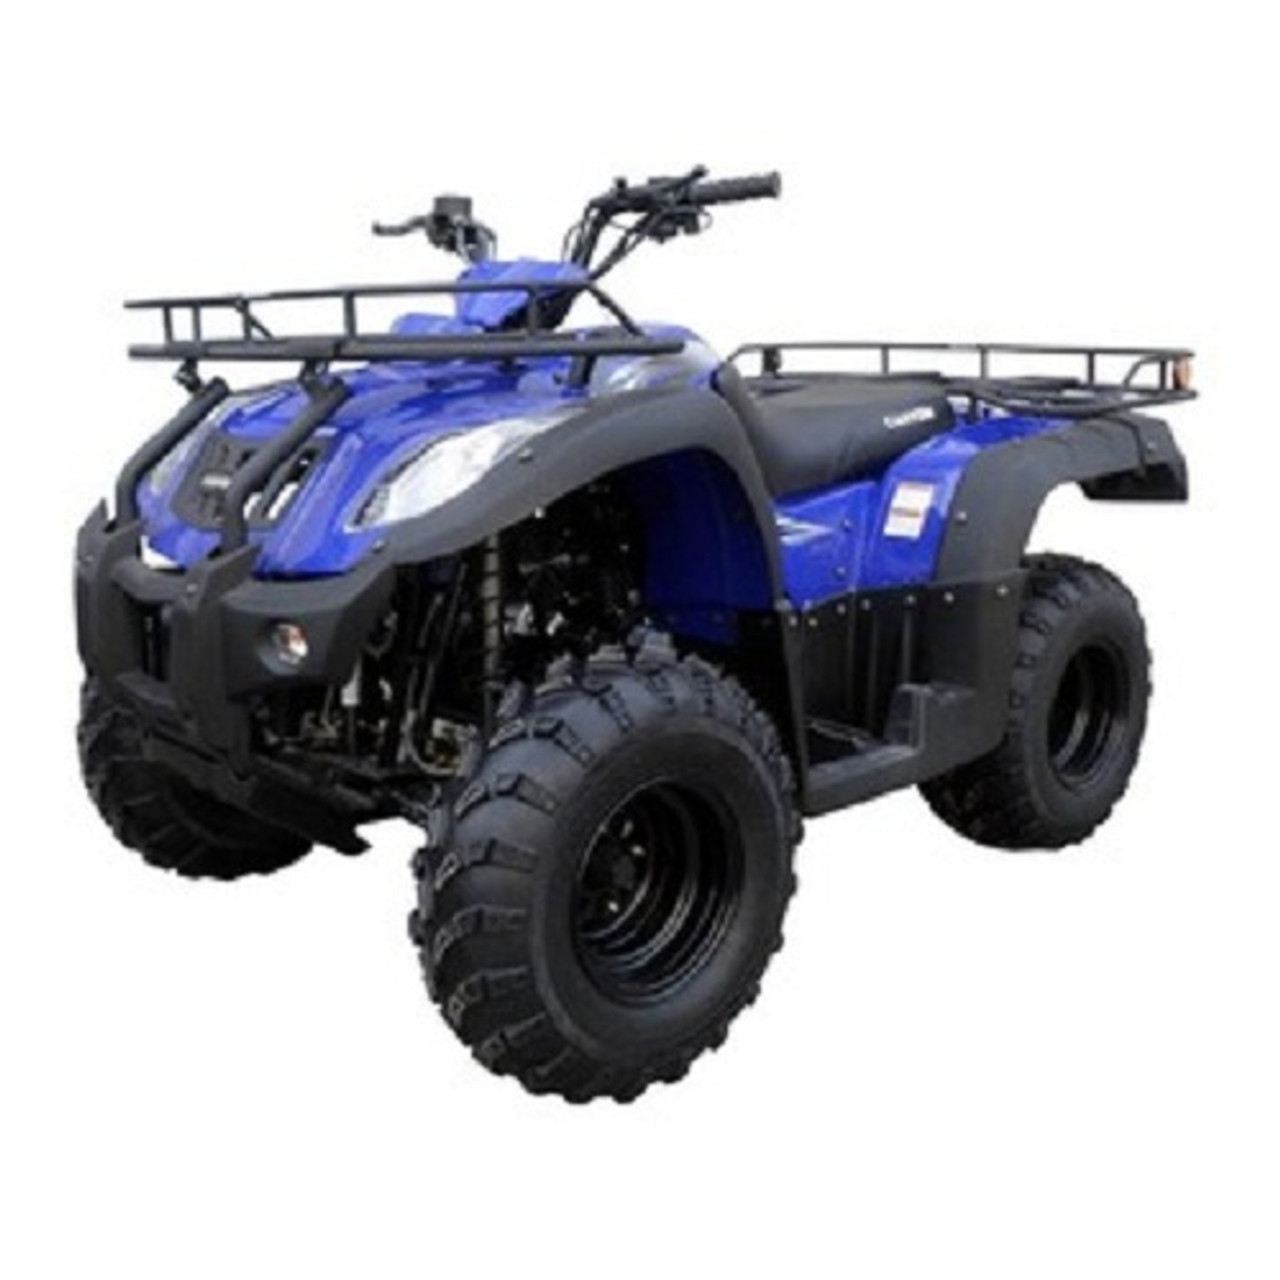 Vitacci CANYON 250cc ATV